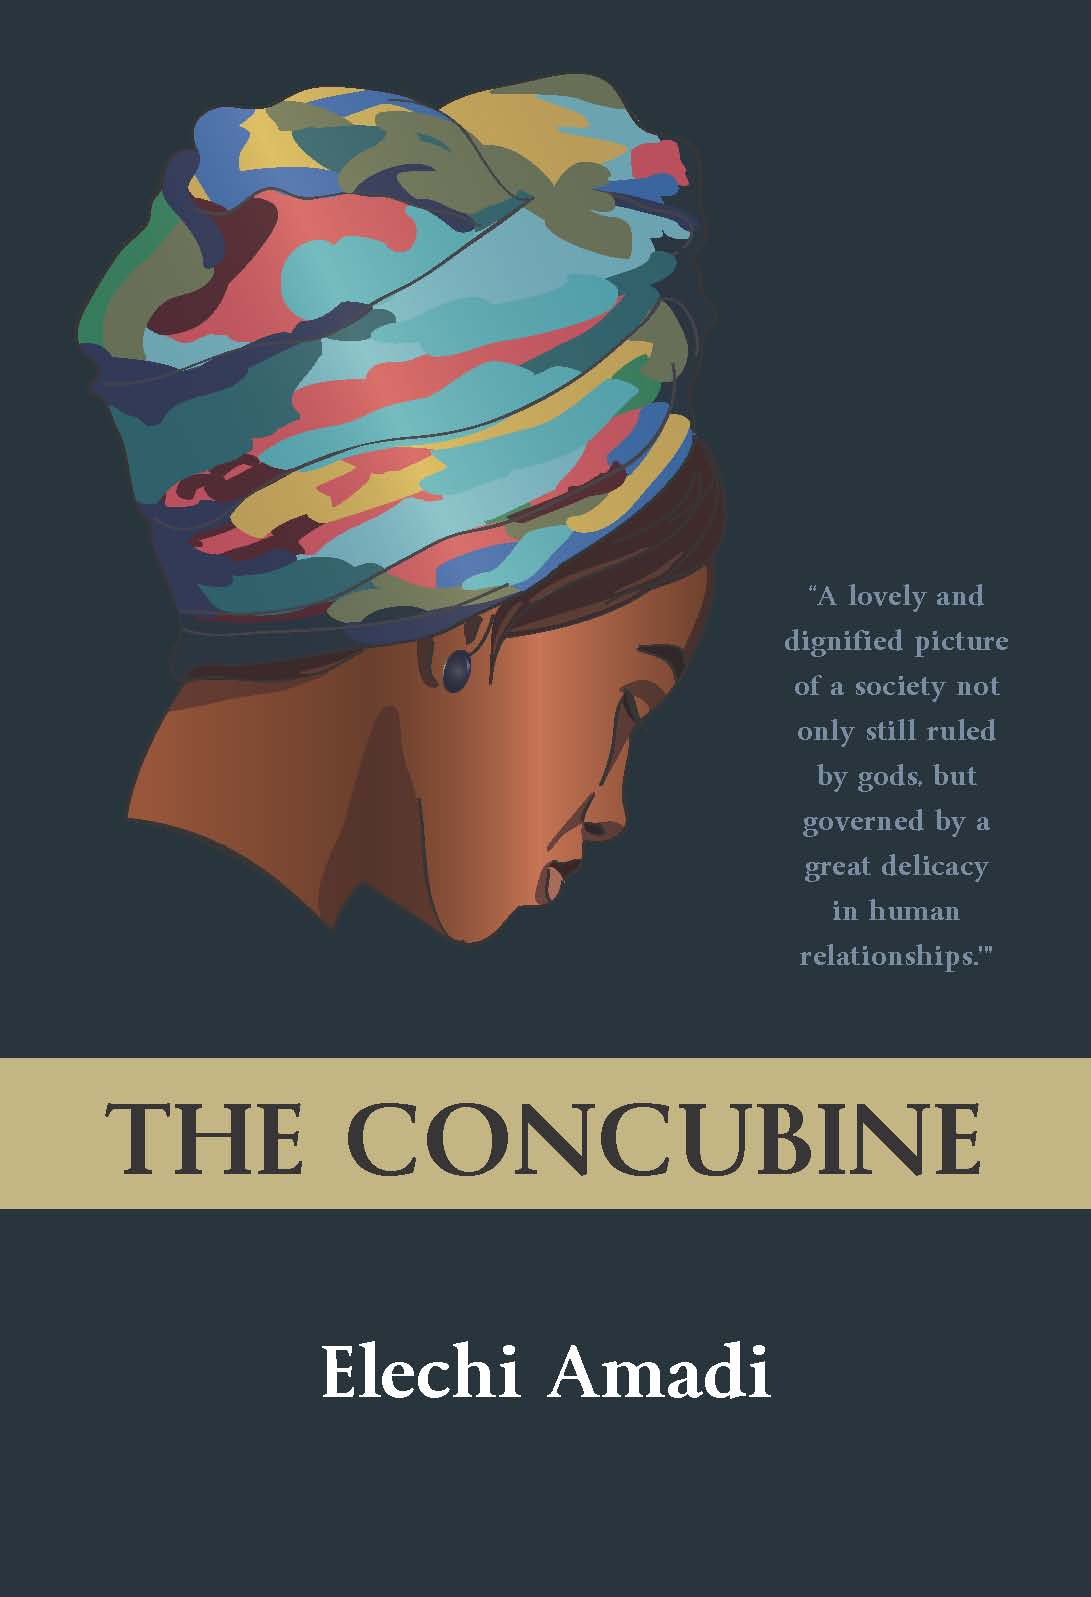 The Concubine:  by Elechi  Amadi